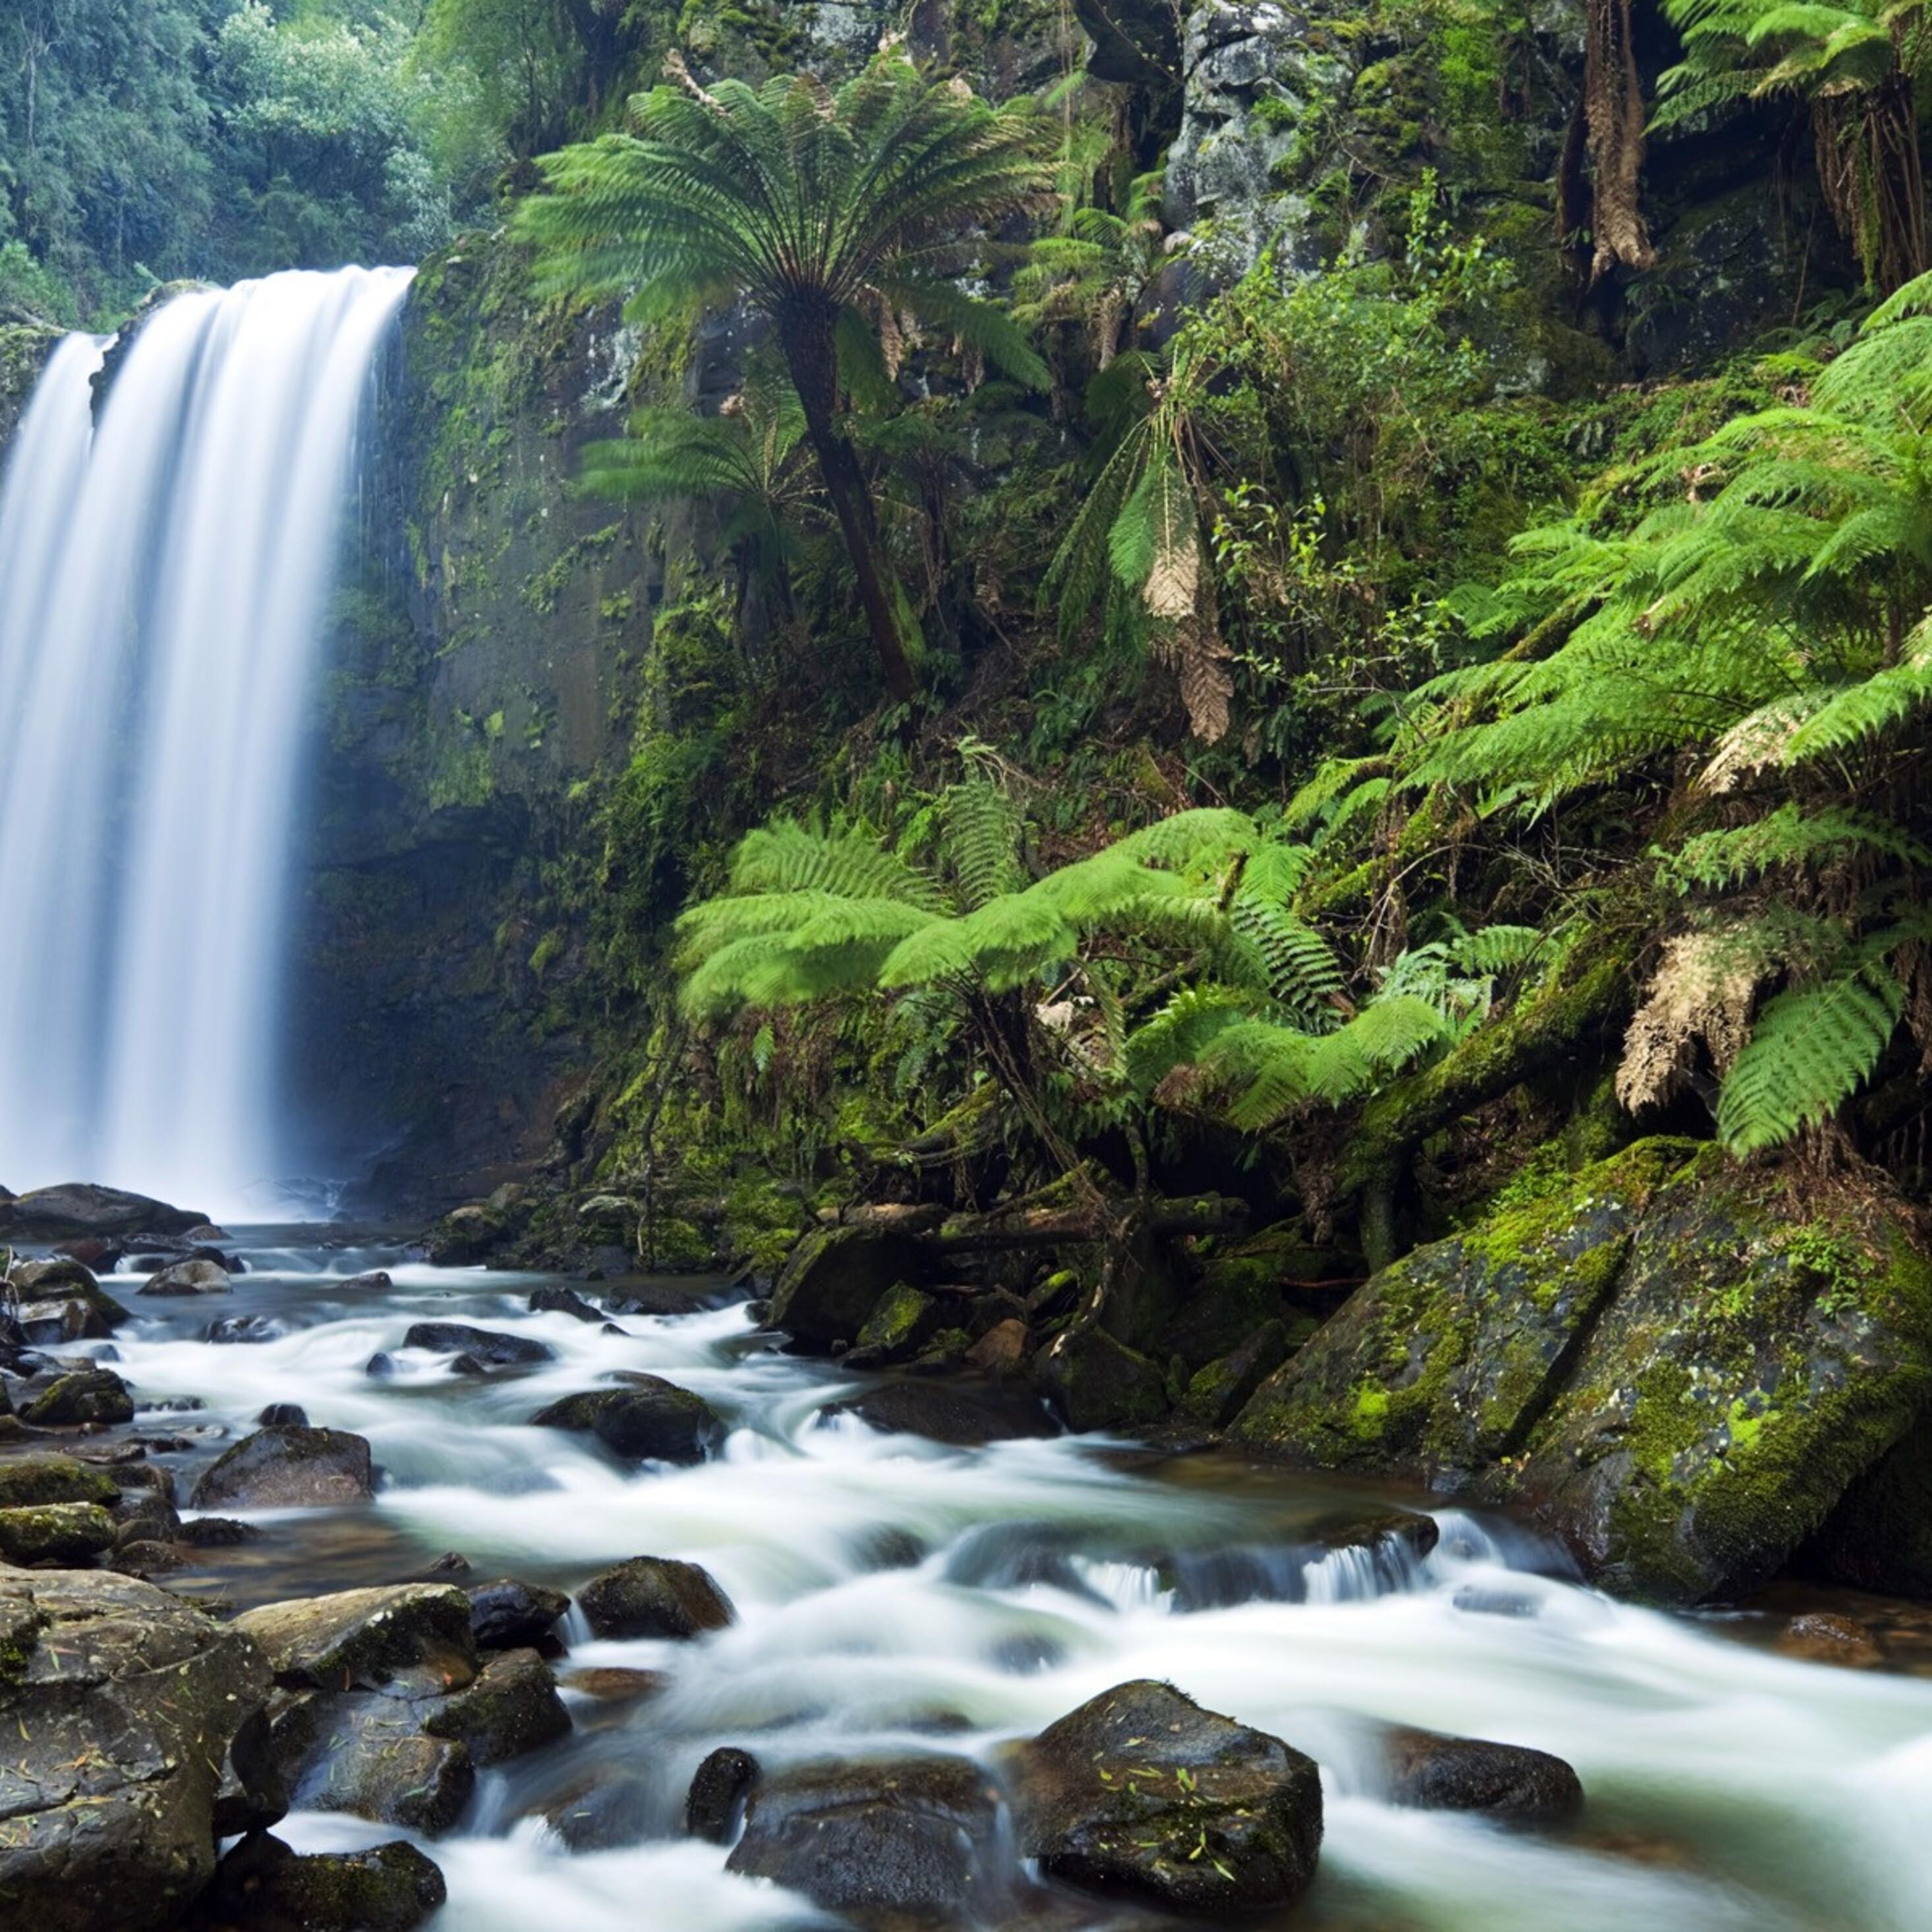 2932x2932 Nature Waterfall Ipad Pro Retina Display HD 4k ...